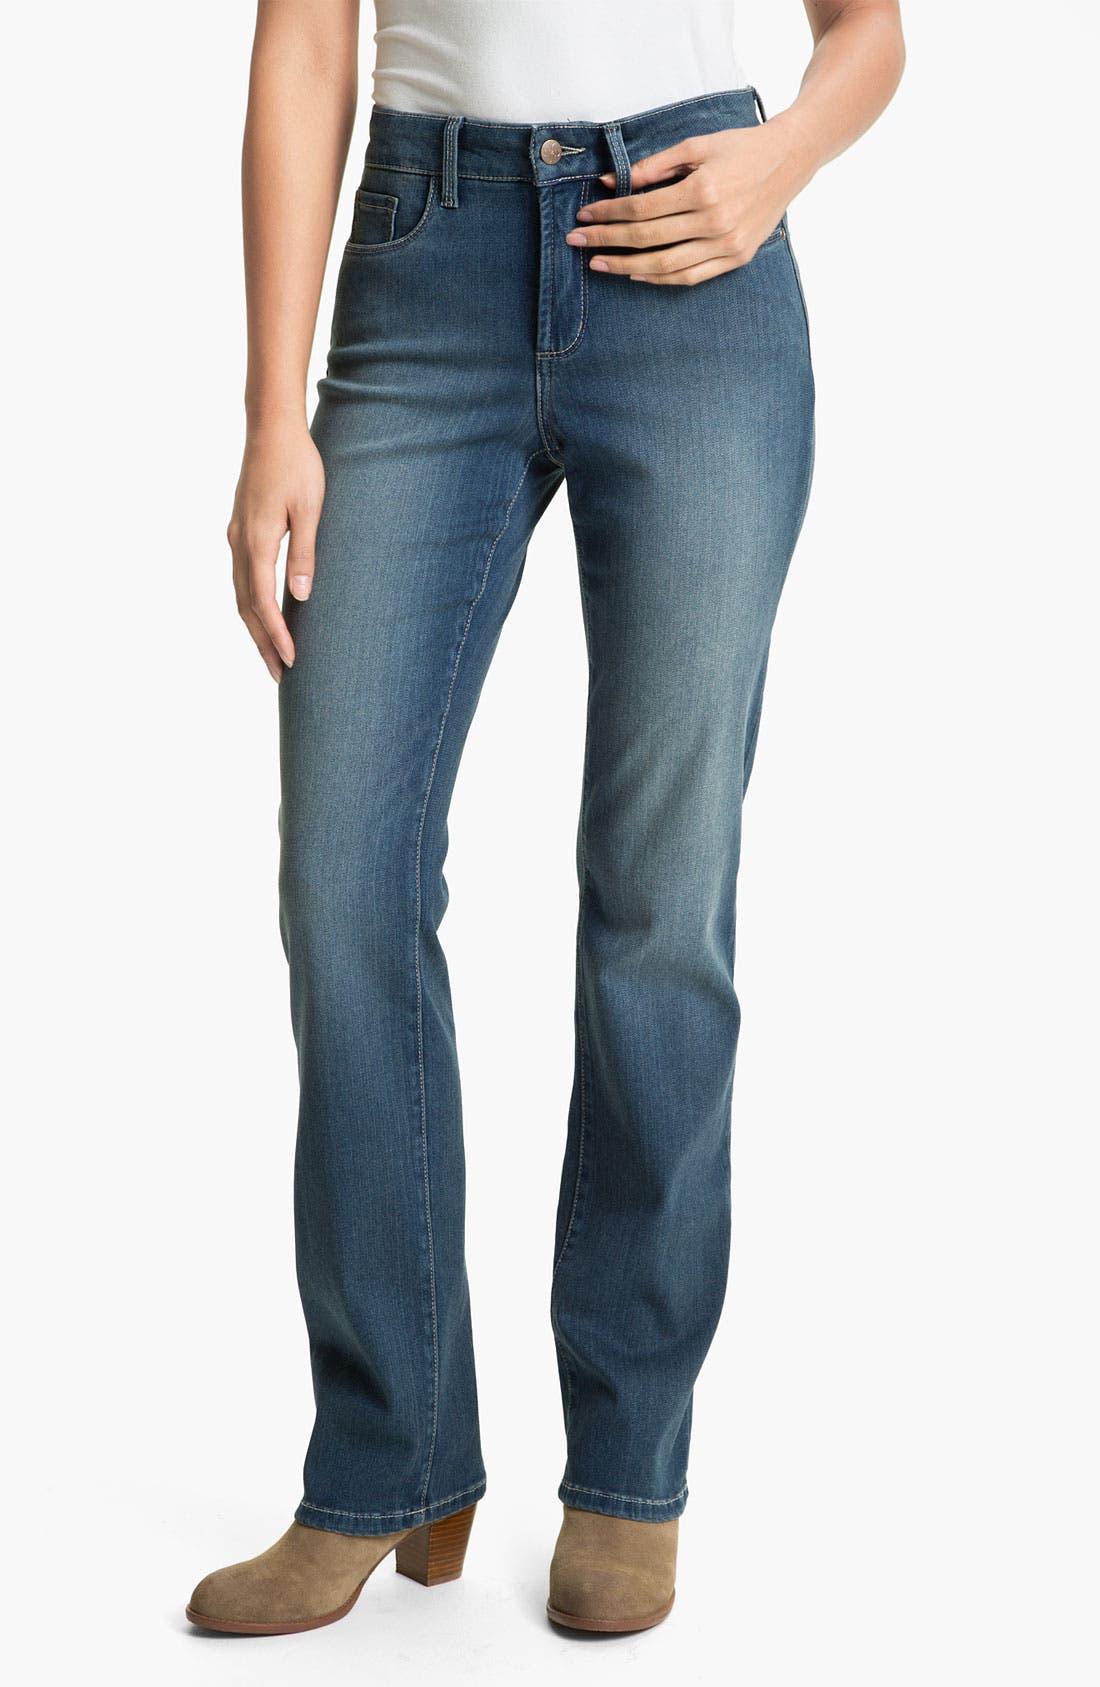 Alternate Image 1 Selected - NYDJ Straight Leg Stretch Jeans (Petite)